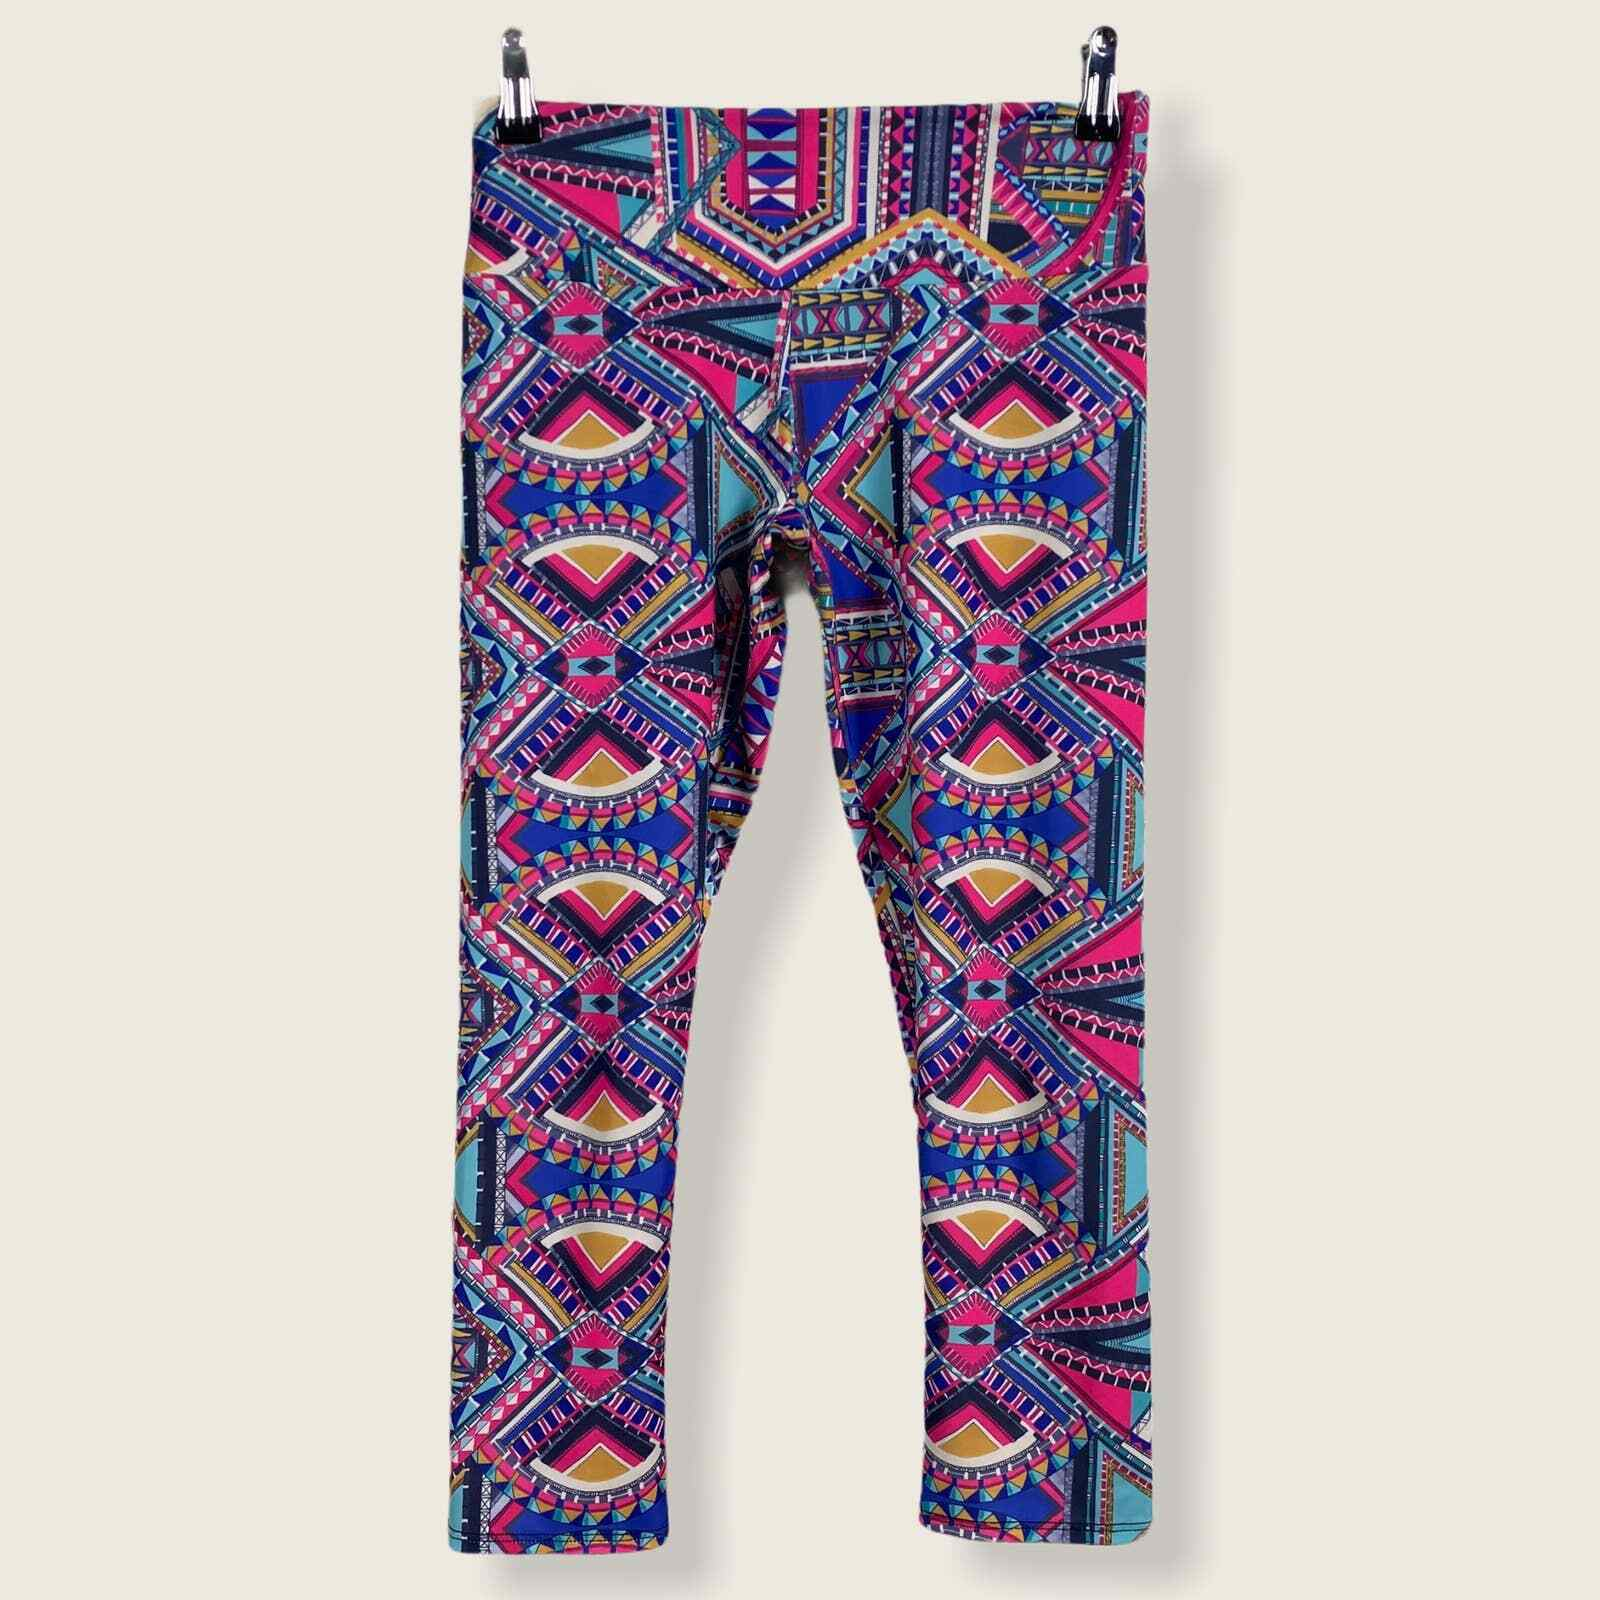 Onzie Colorful Printed Cropped Capri Leggings SMALL MEDIUM Pink Teal Gym Yoga